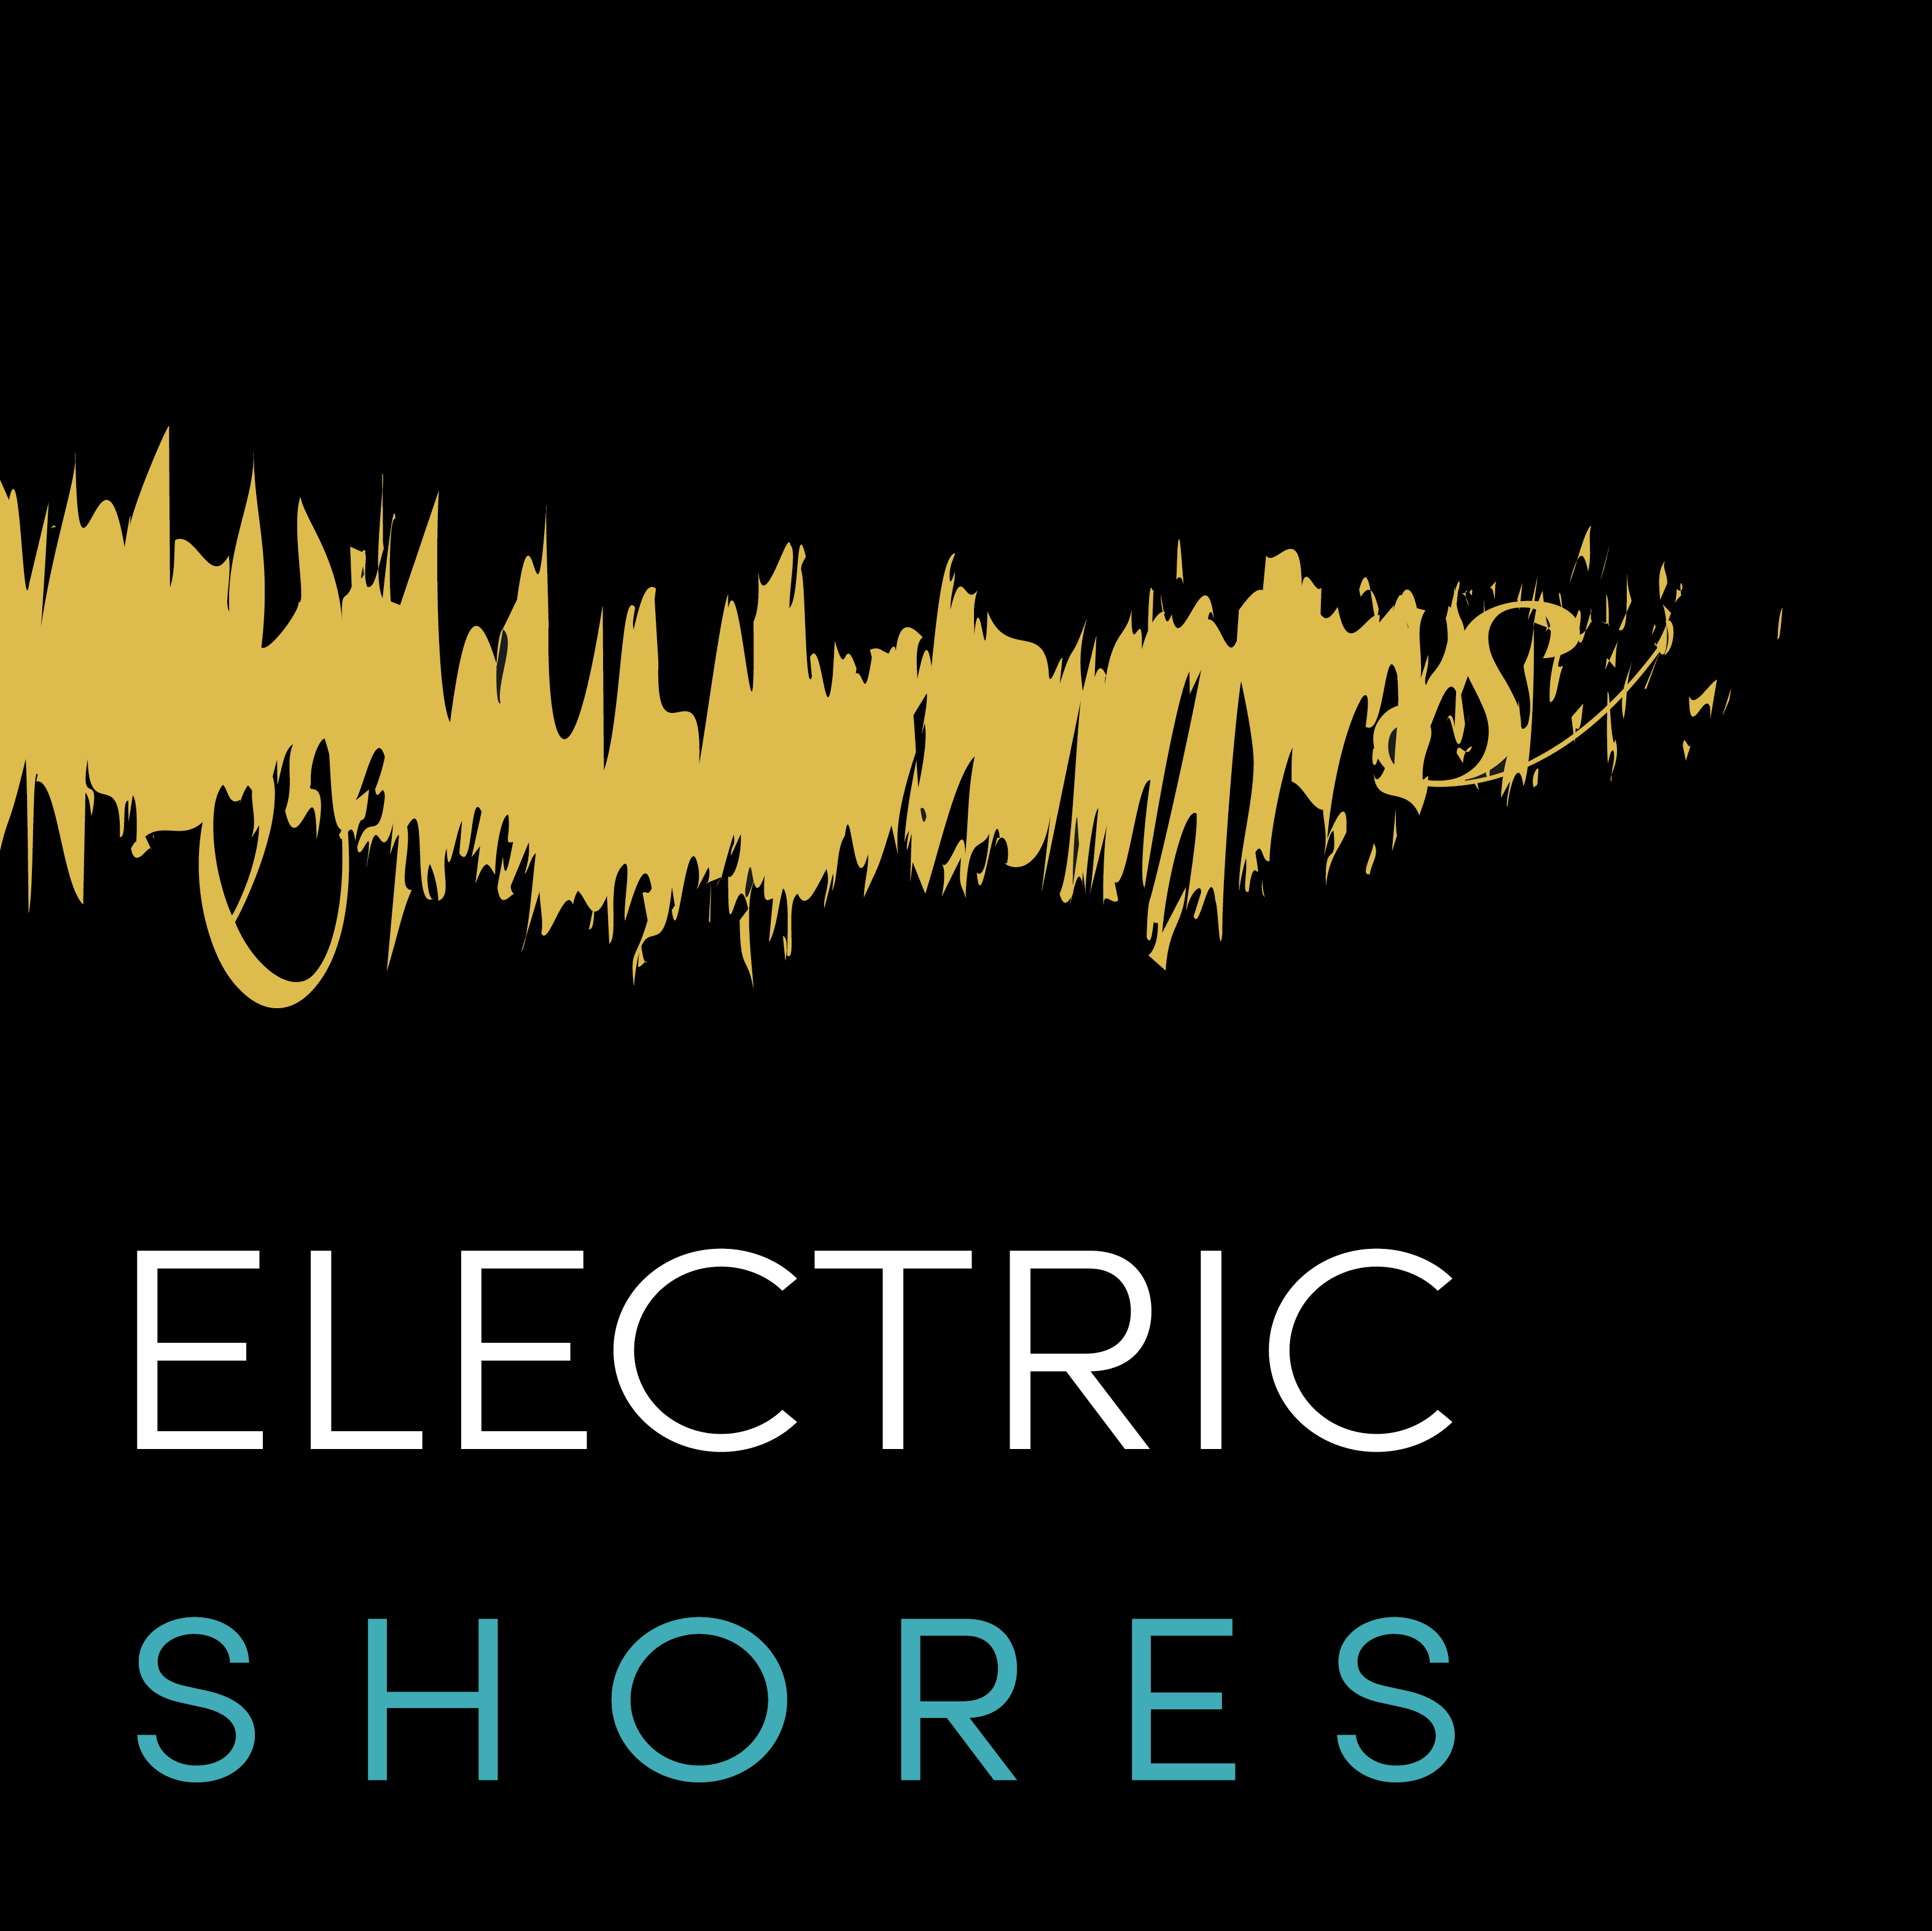 Electric Shores